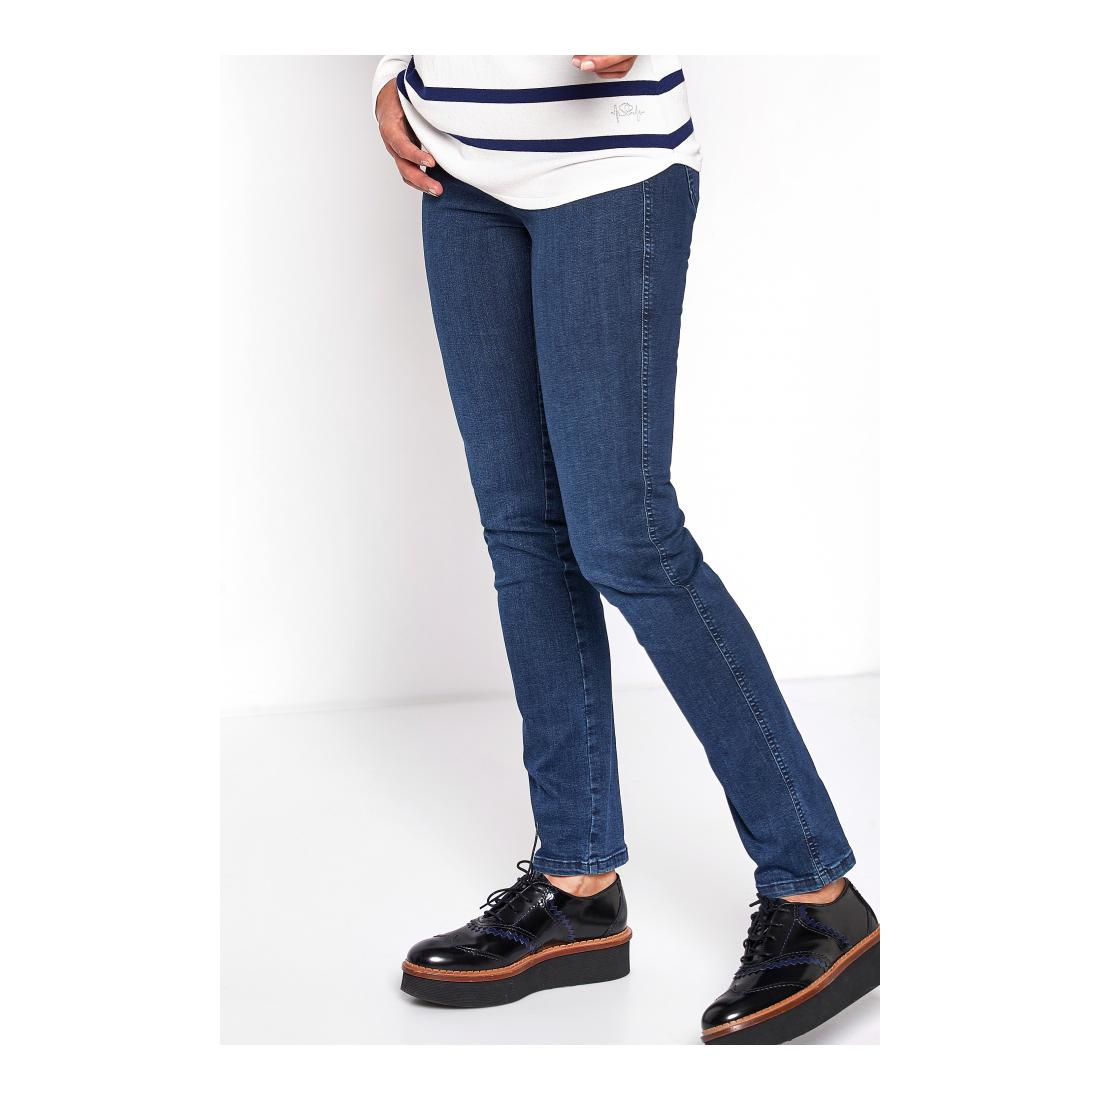 TONI DRESS Jeans Damen CS-be loved